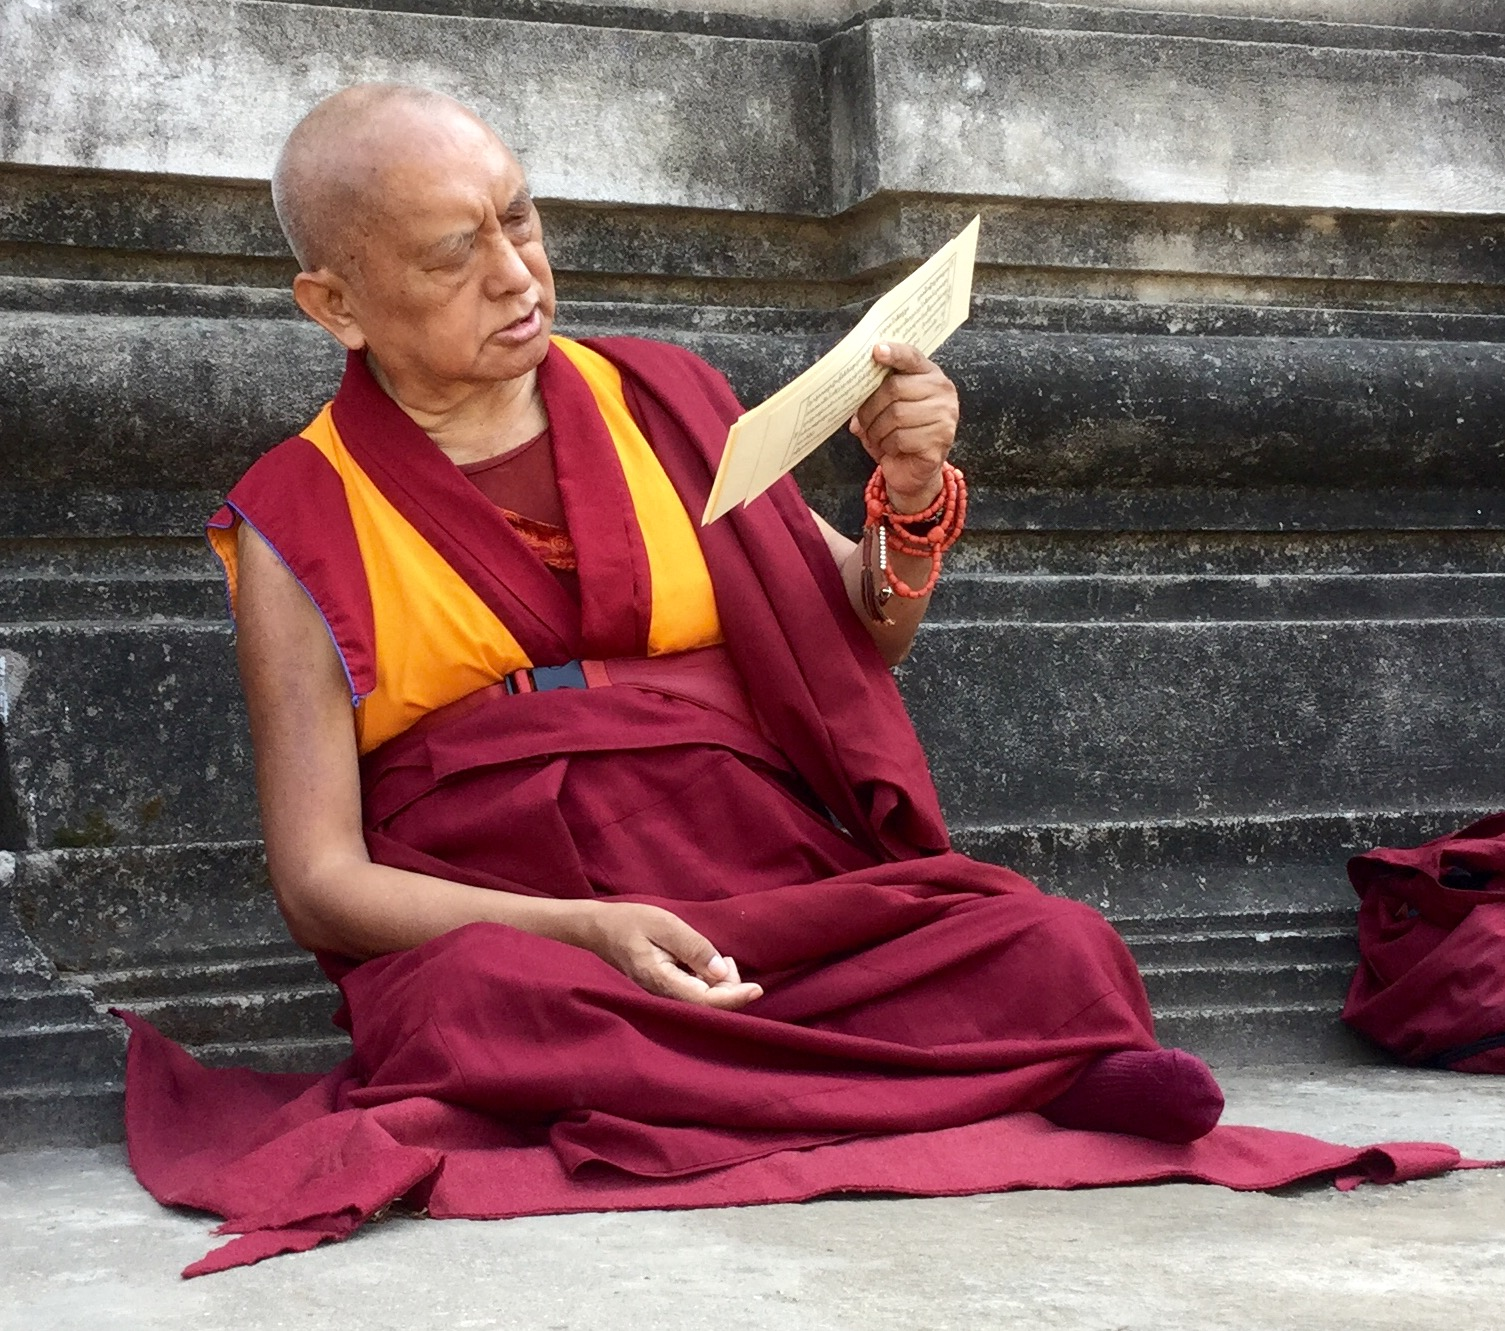 Lama Zopa Rinpoche reciting teachings on emptiness at the Mahabodhi stupa, Bodhgaya. (Photo Ven Sarah Thresher)